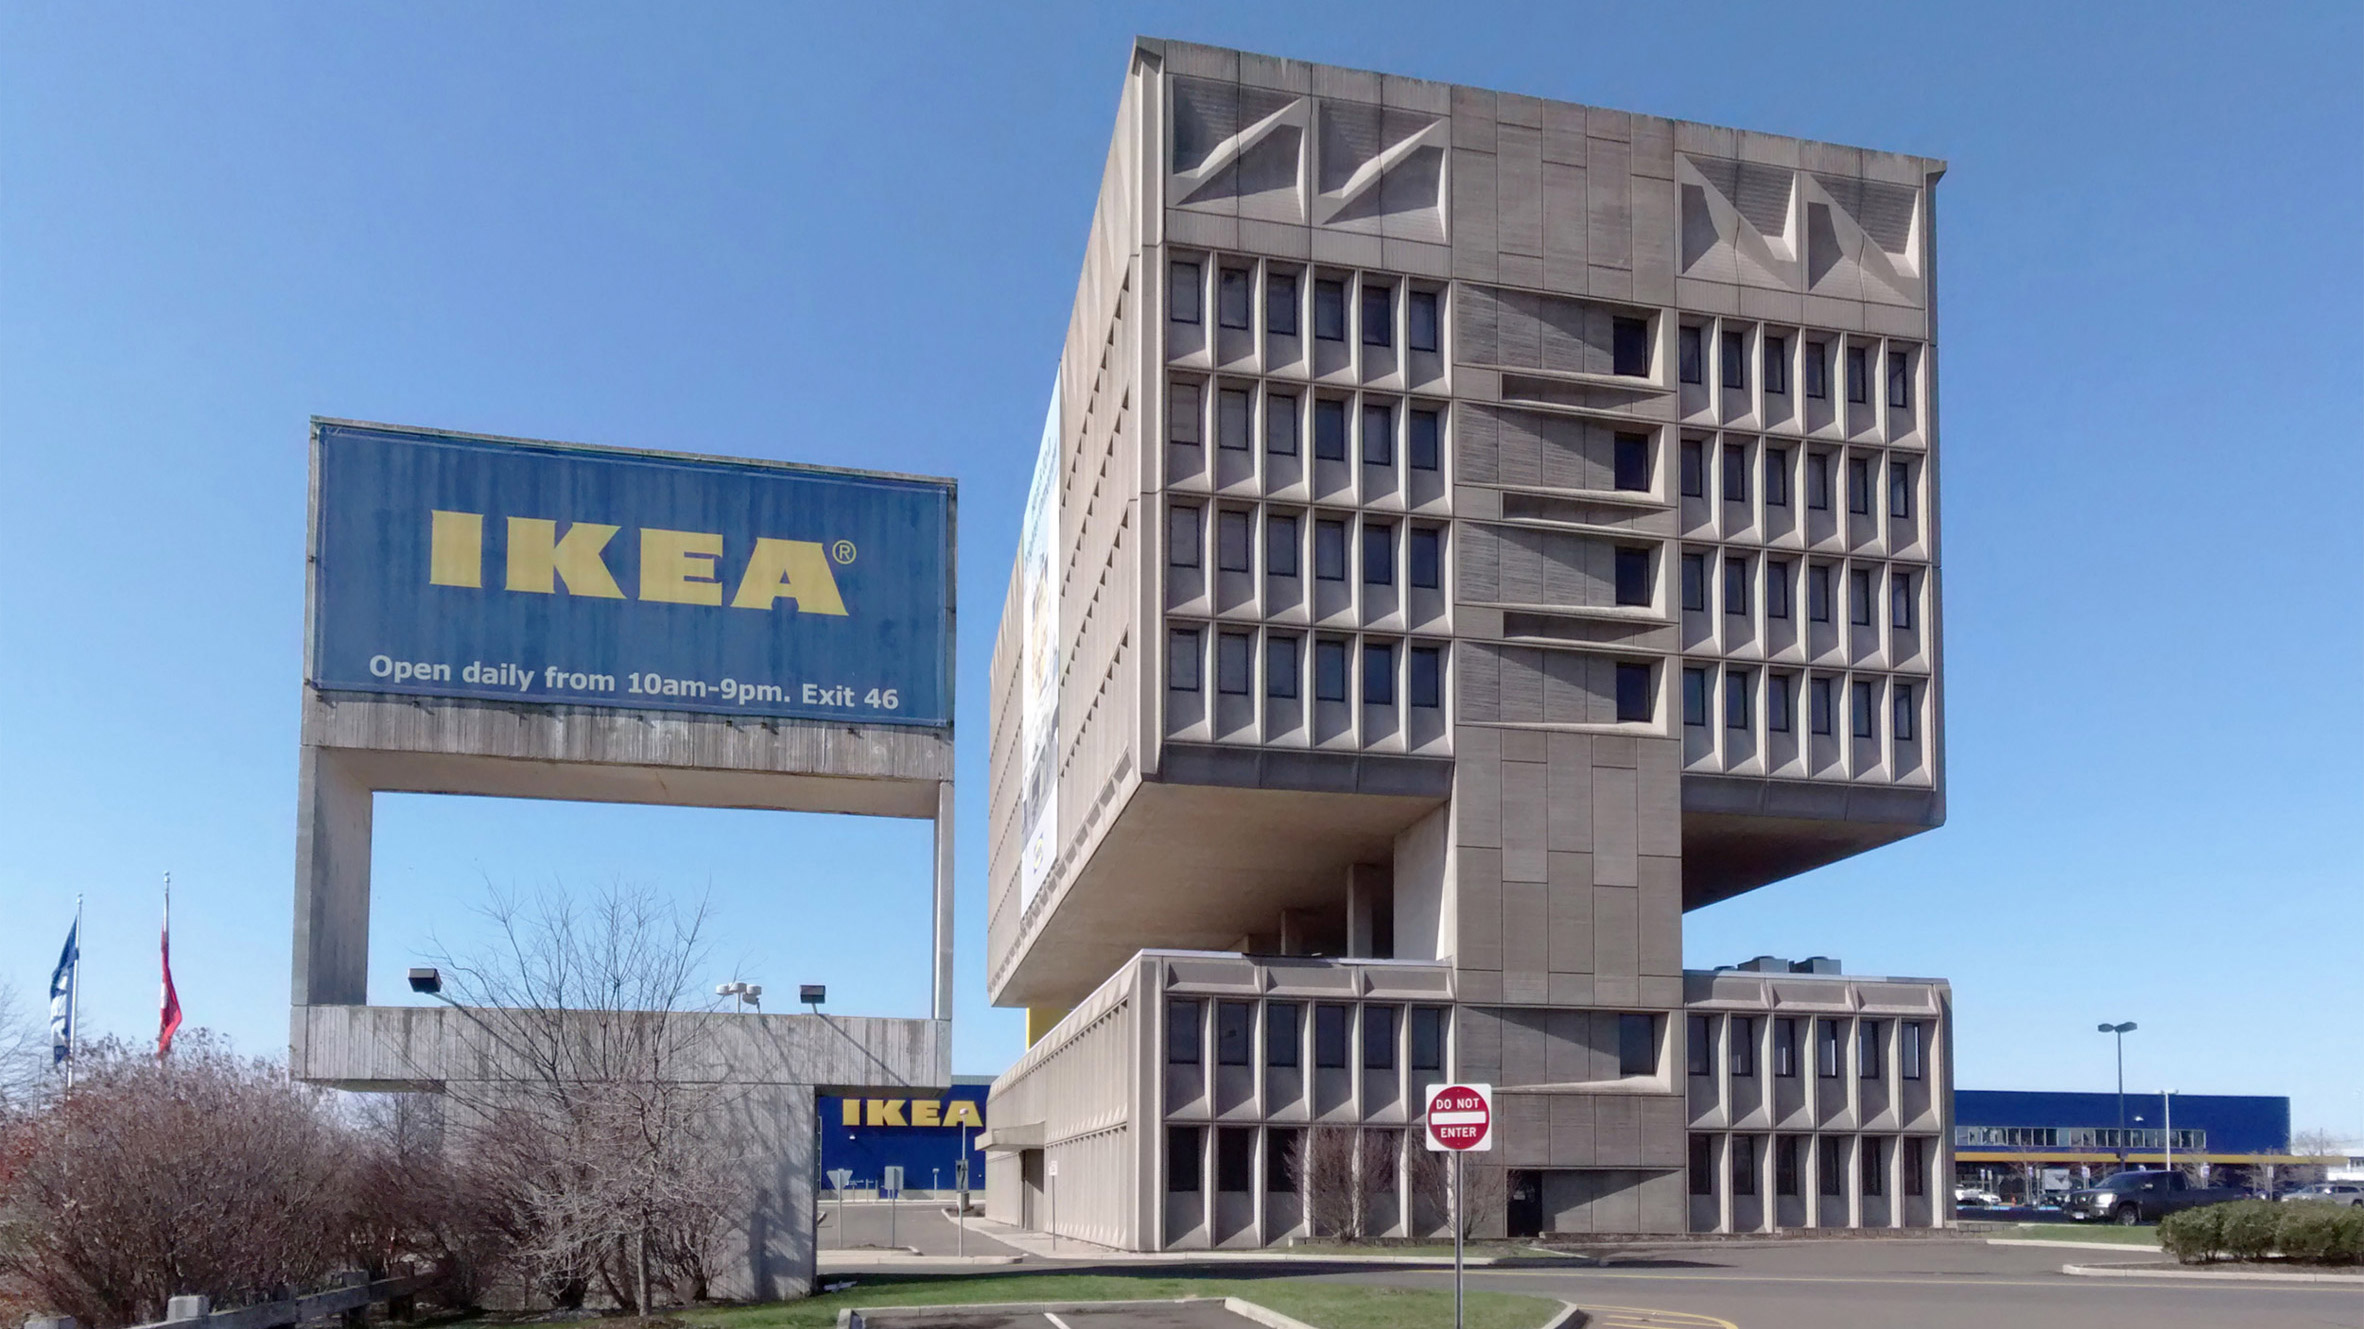 Shot of brutalist building next to Ikea sign.